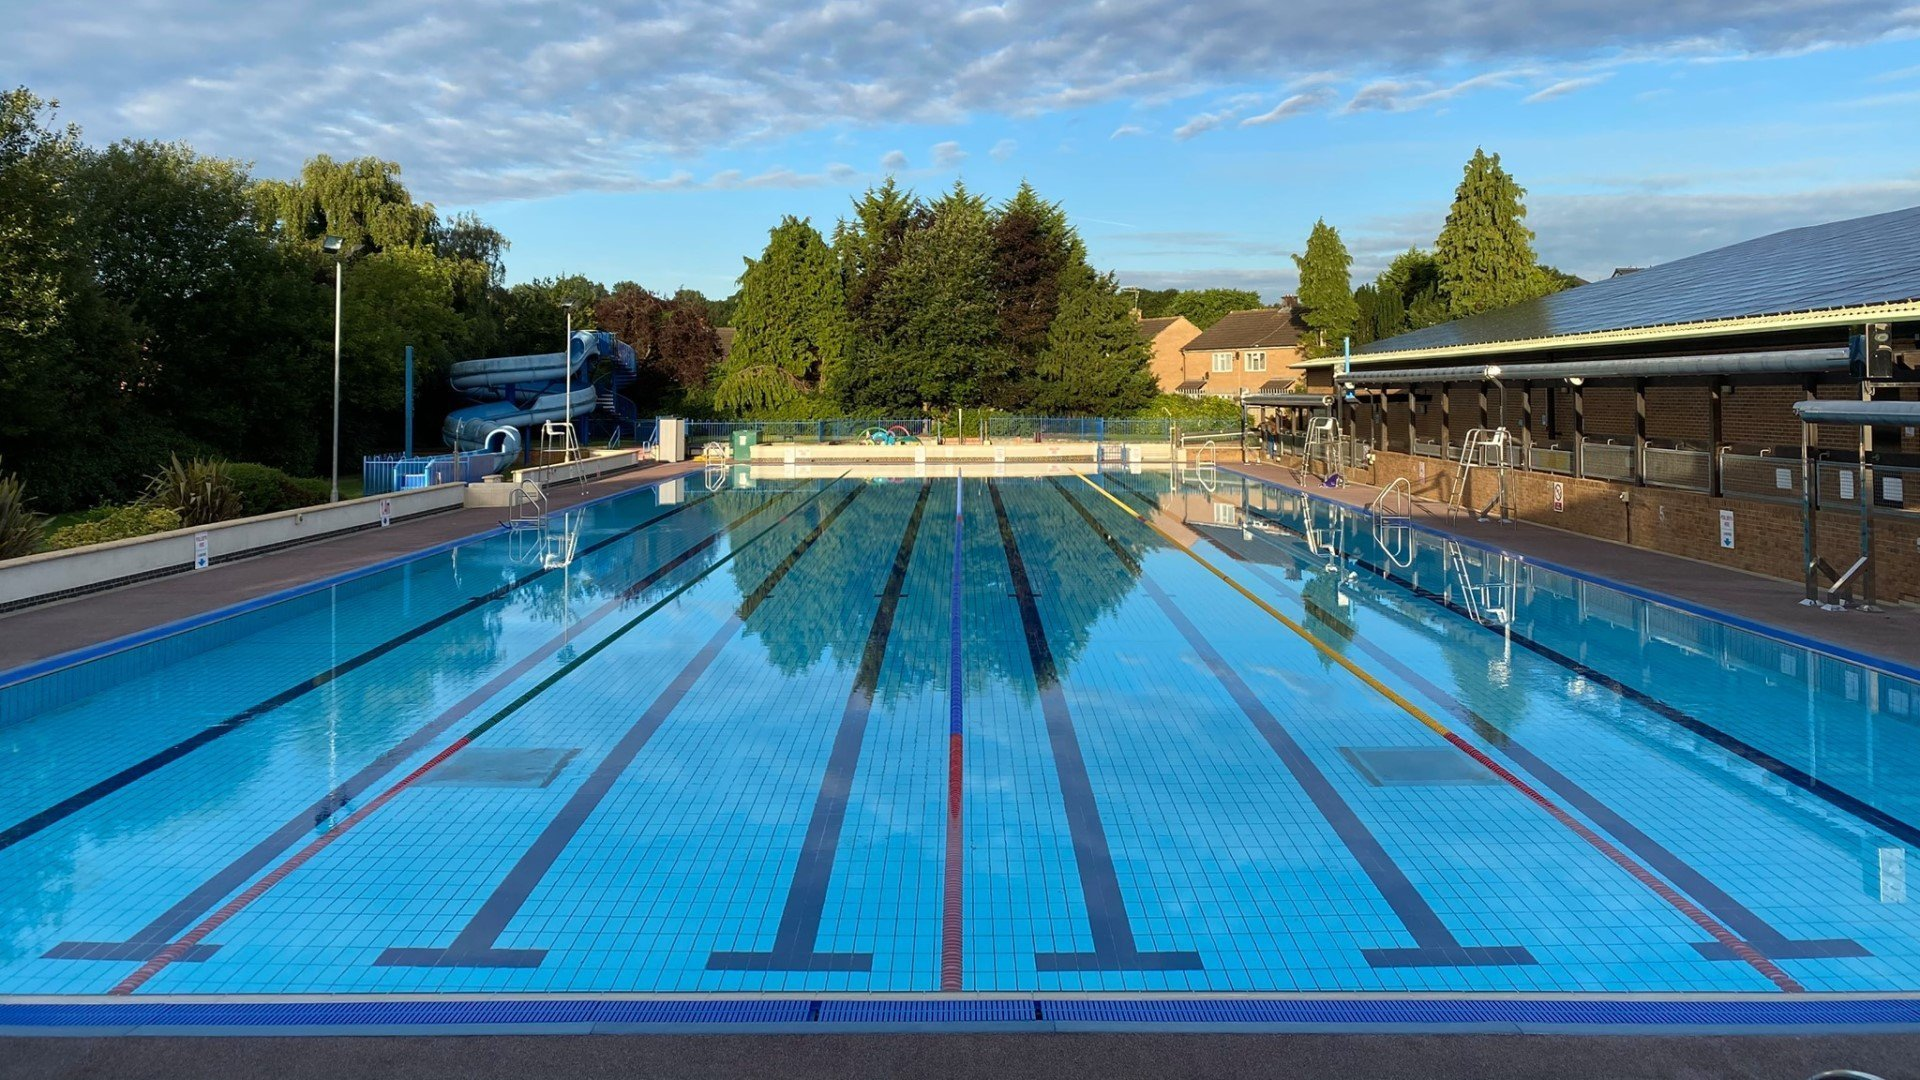 Banbury Open Air Pool, Banbury